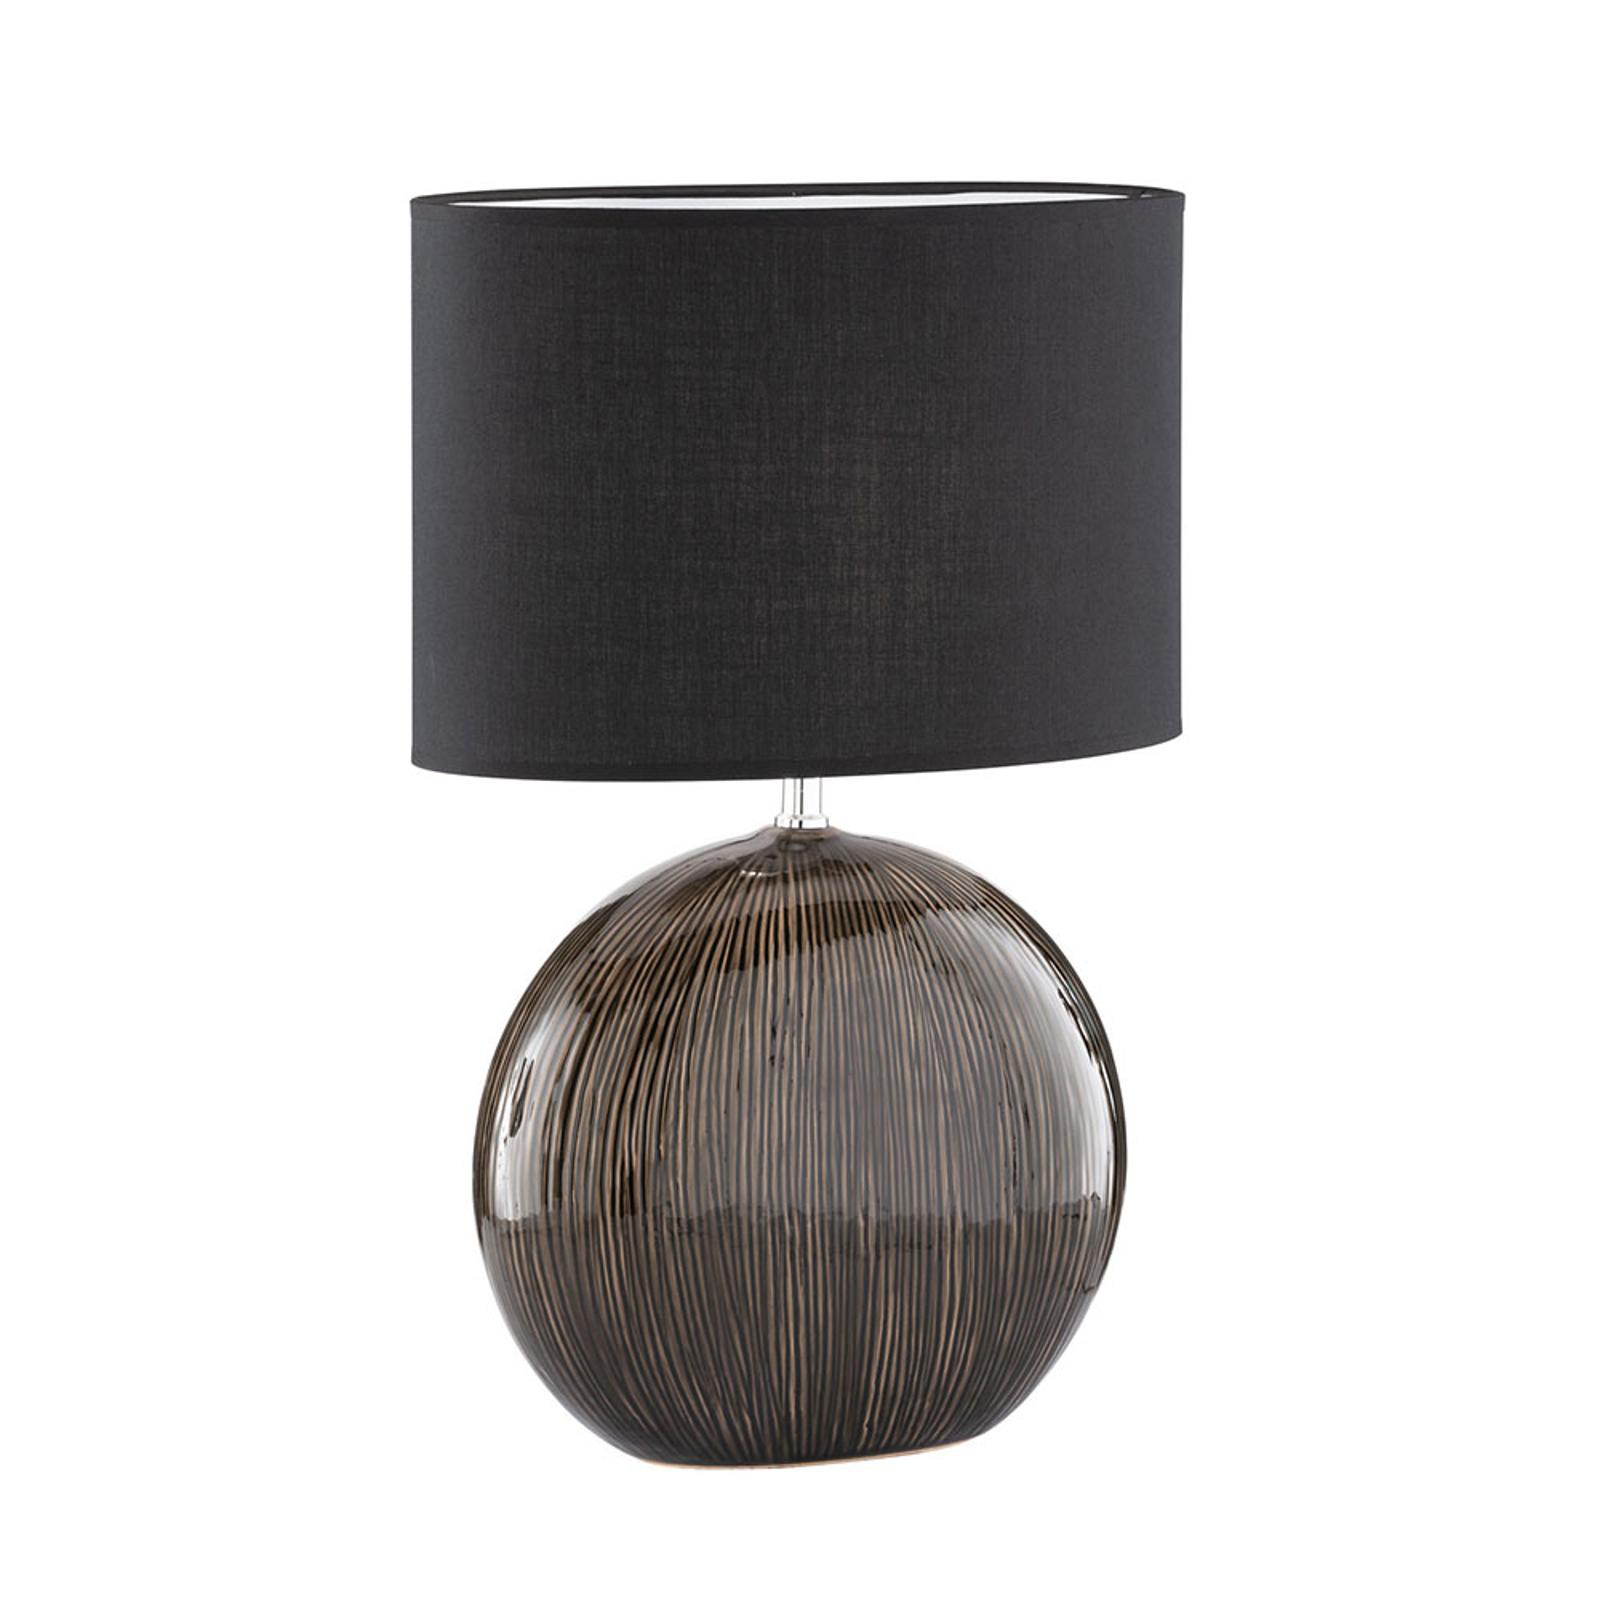 Bordlampe Marin med keramisk fot, høyde 53 cm